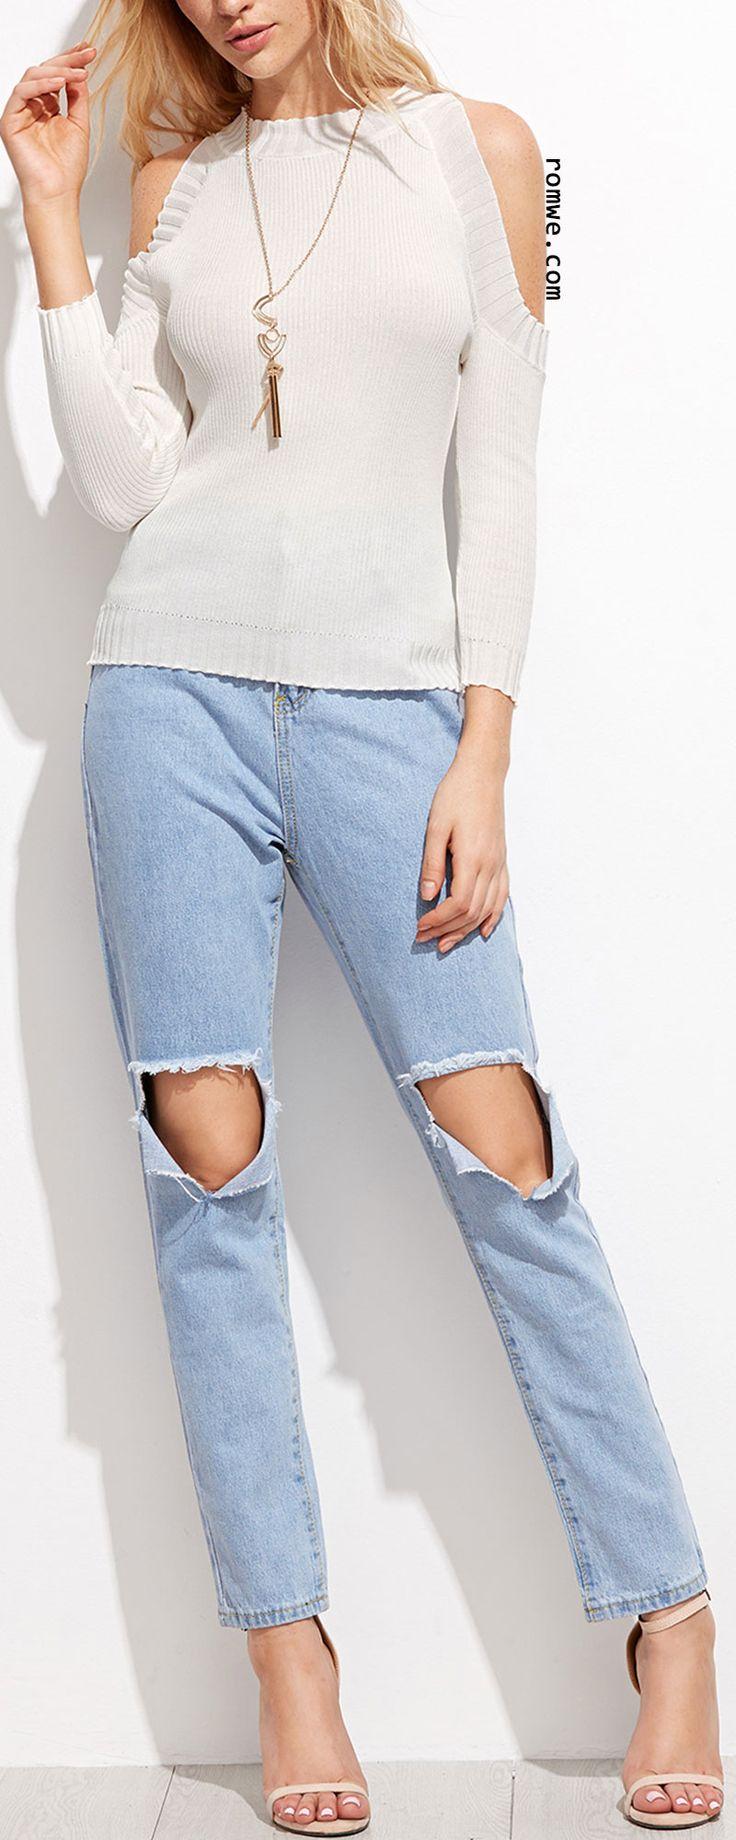 Light Blue Ripped Ankle Denim Jeans